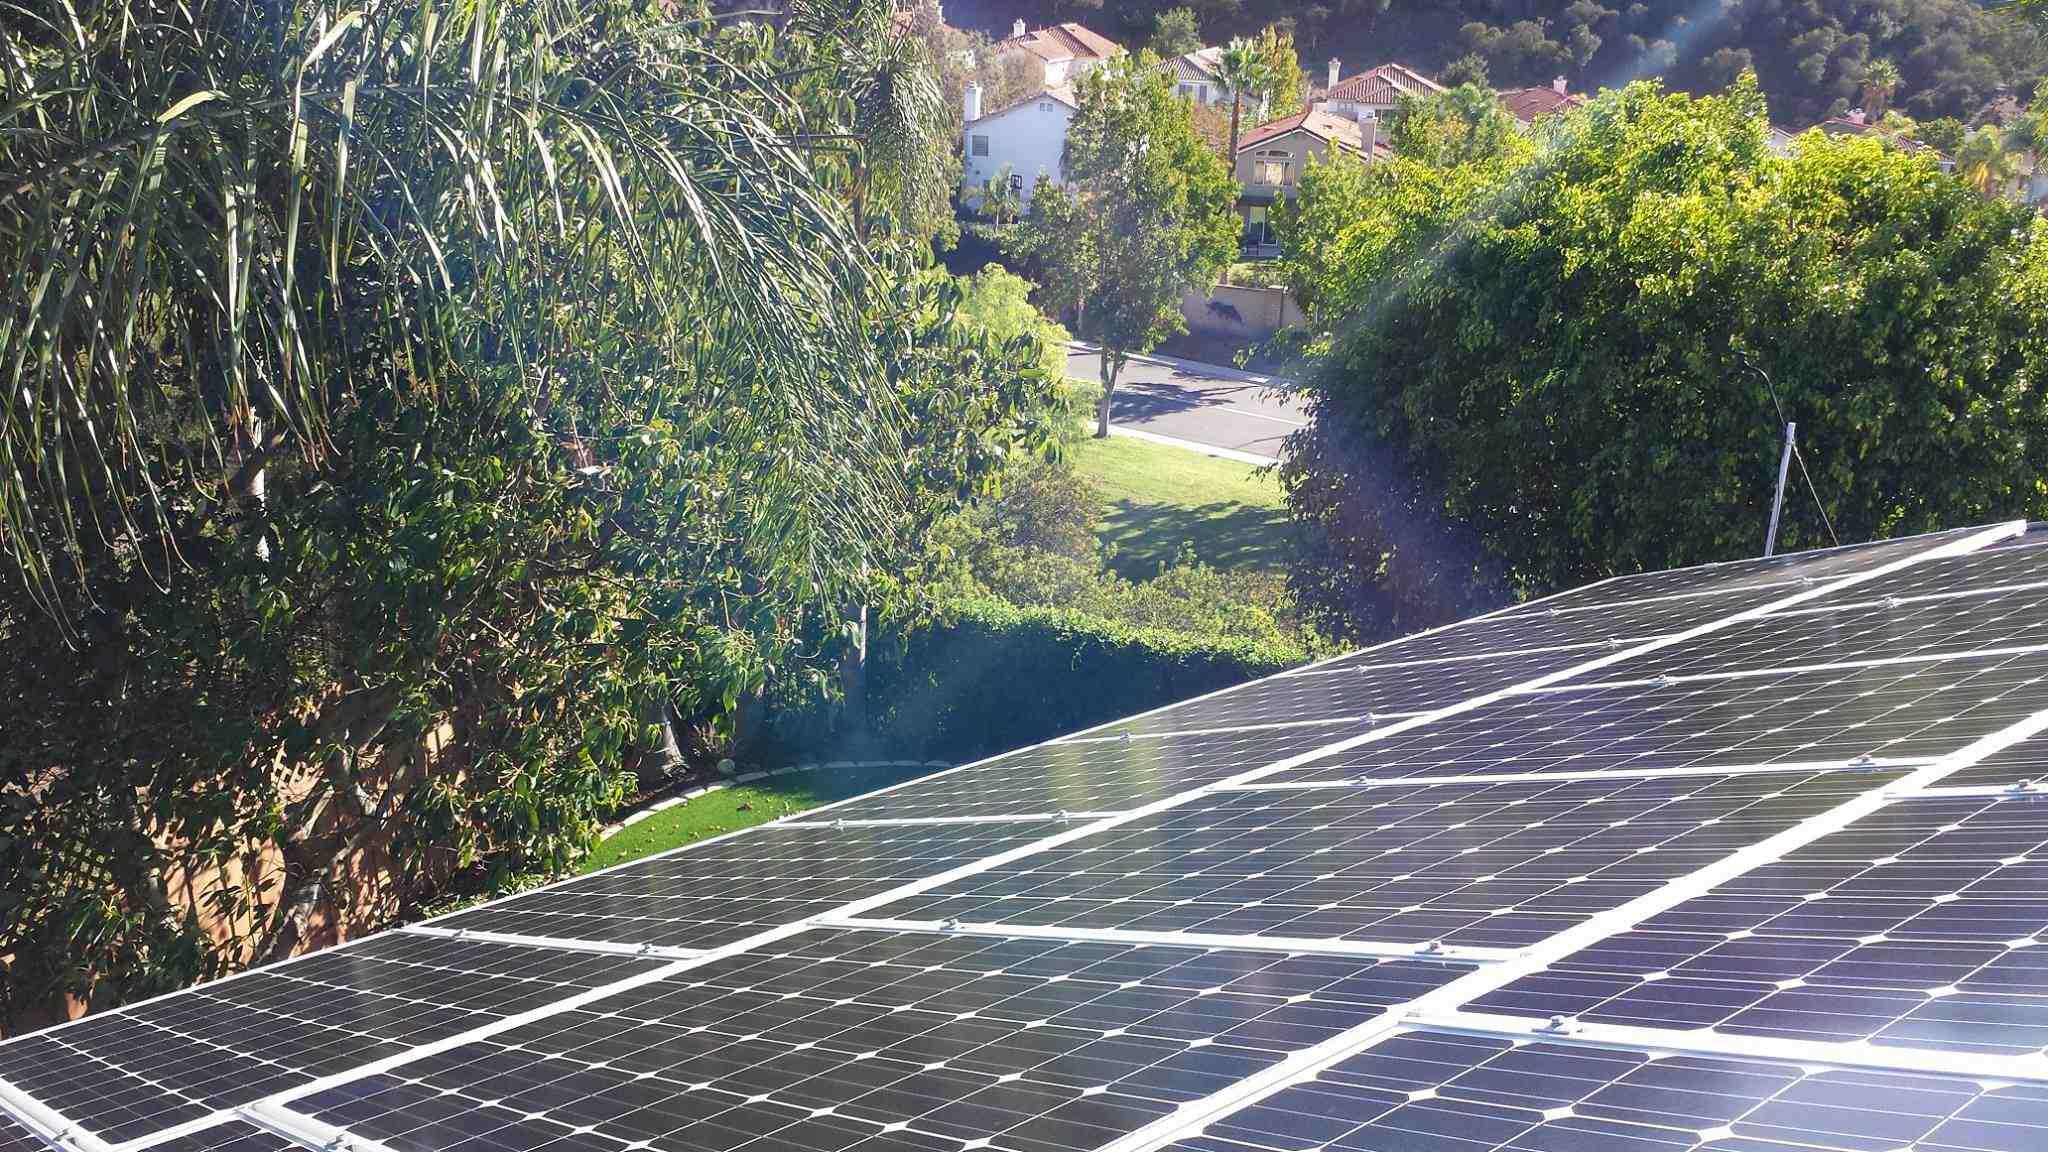 Is grid alternative free?